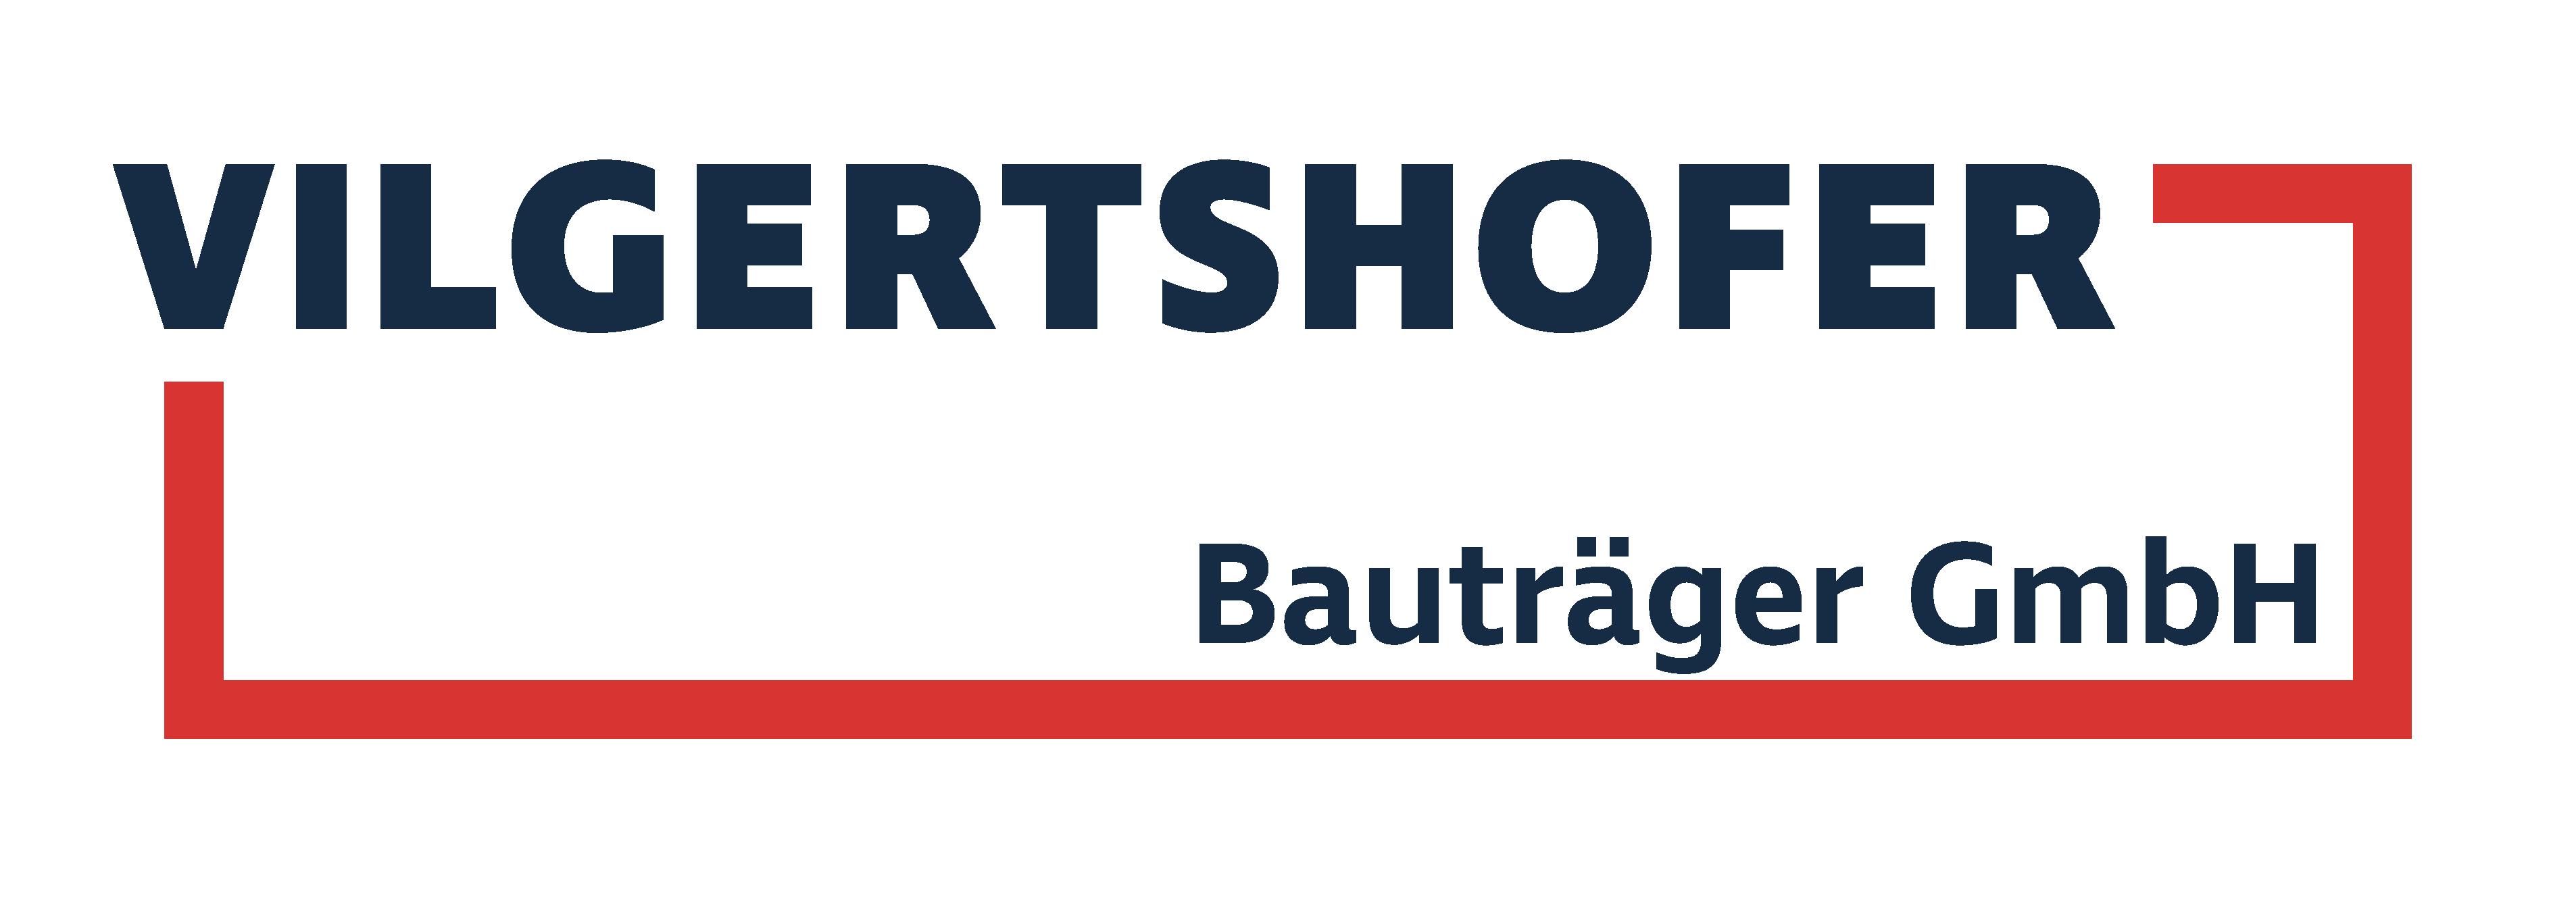 Vilgertshofer Bauträger GmbH Logo